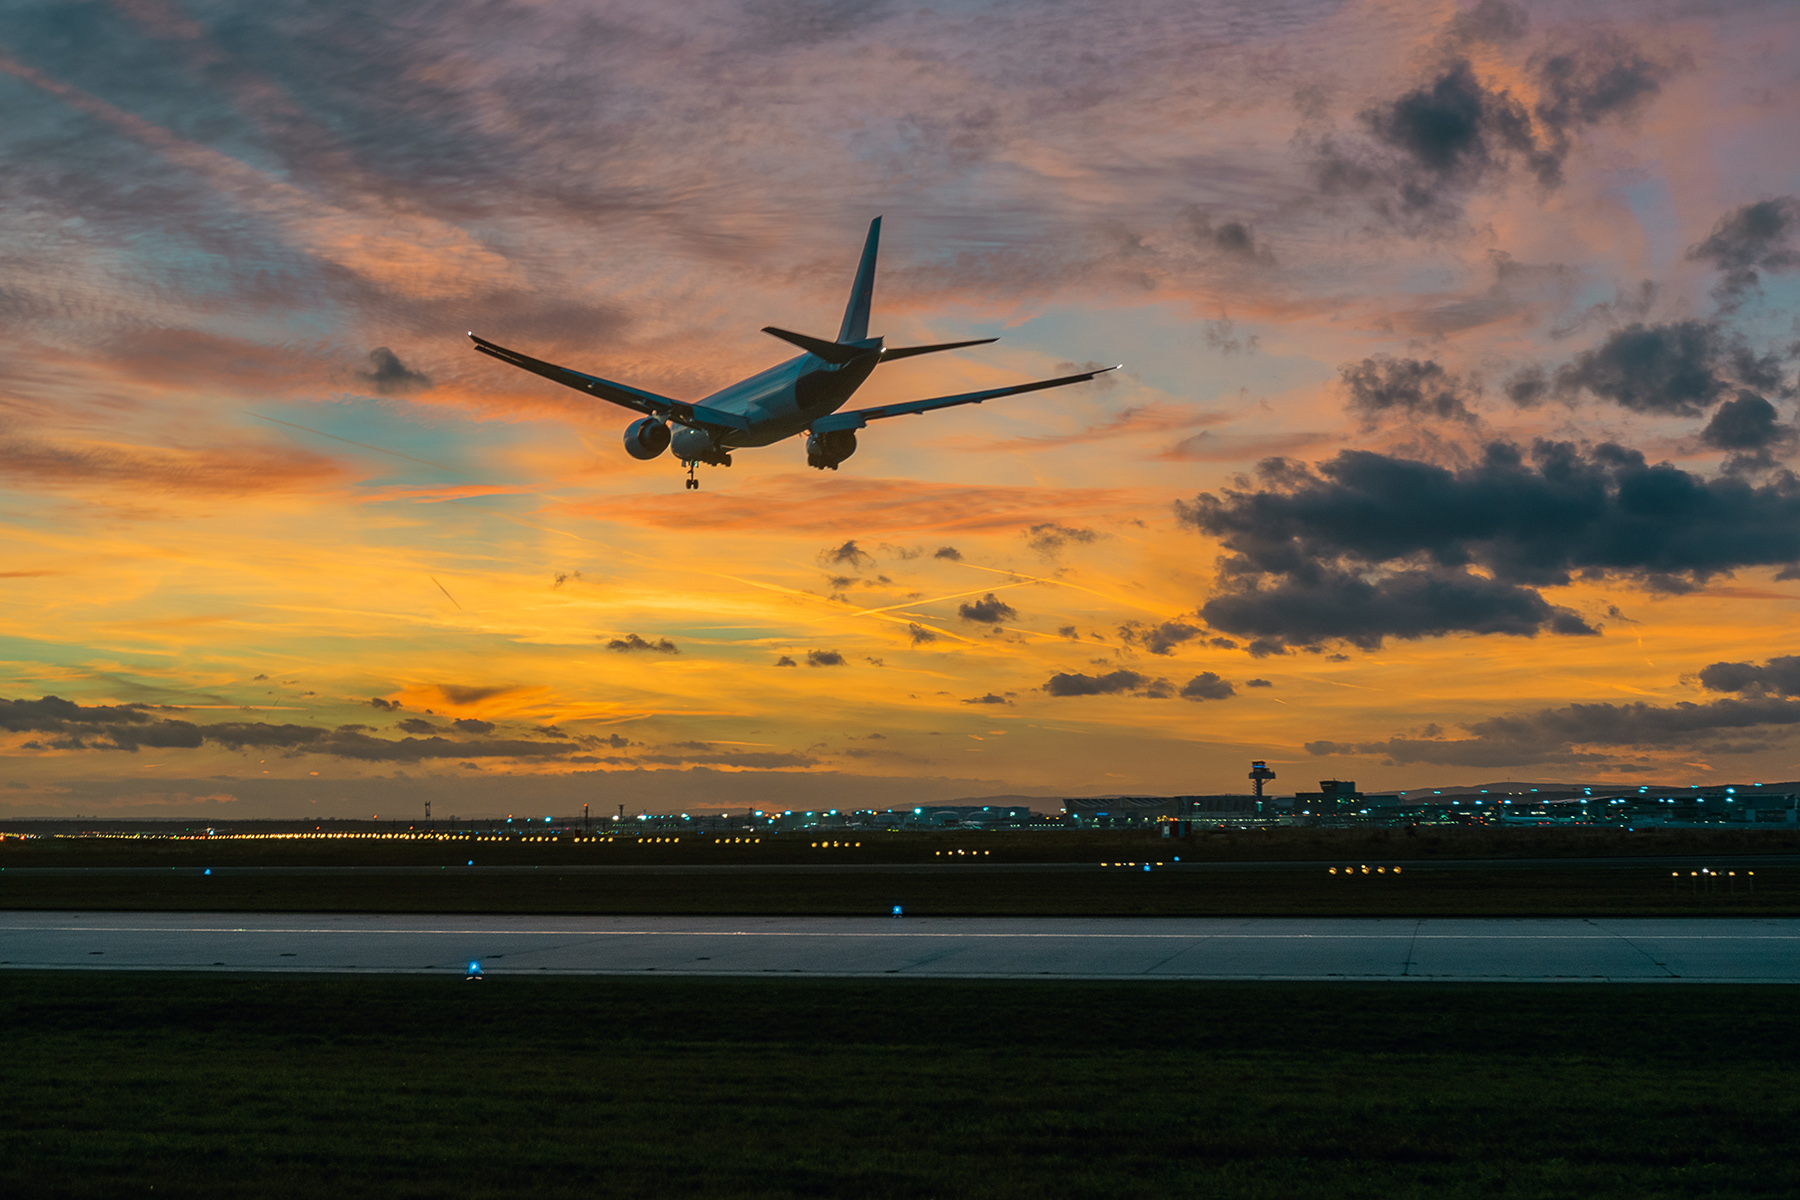 Arrival at Frankfurt International Airport